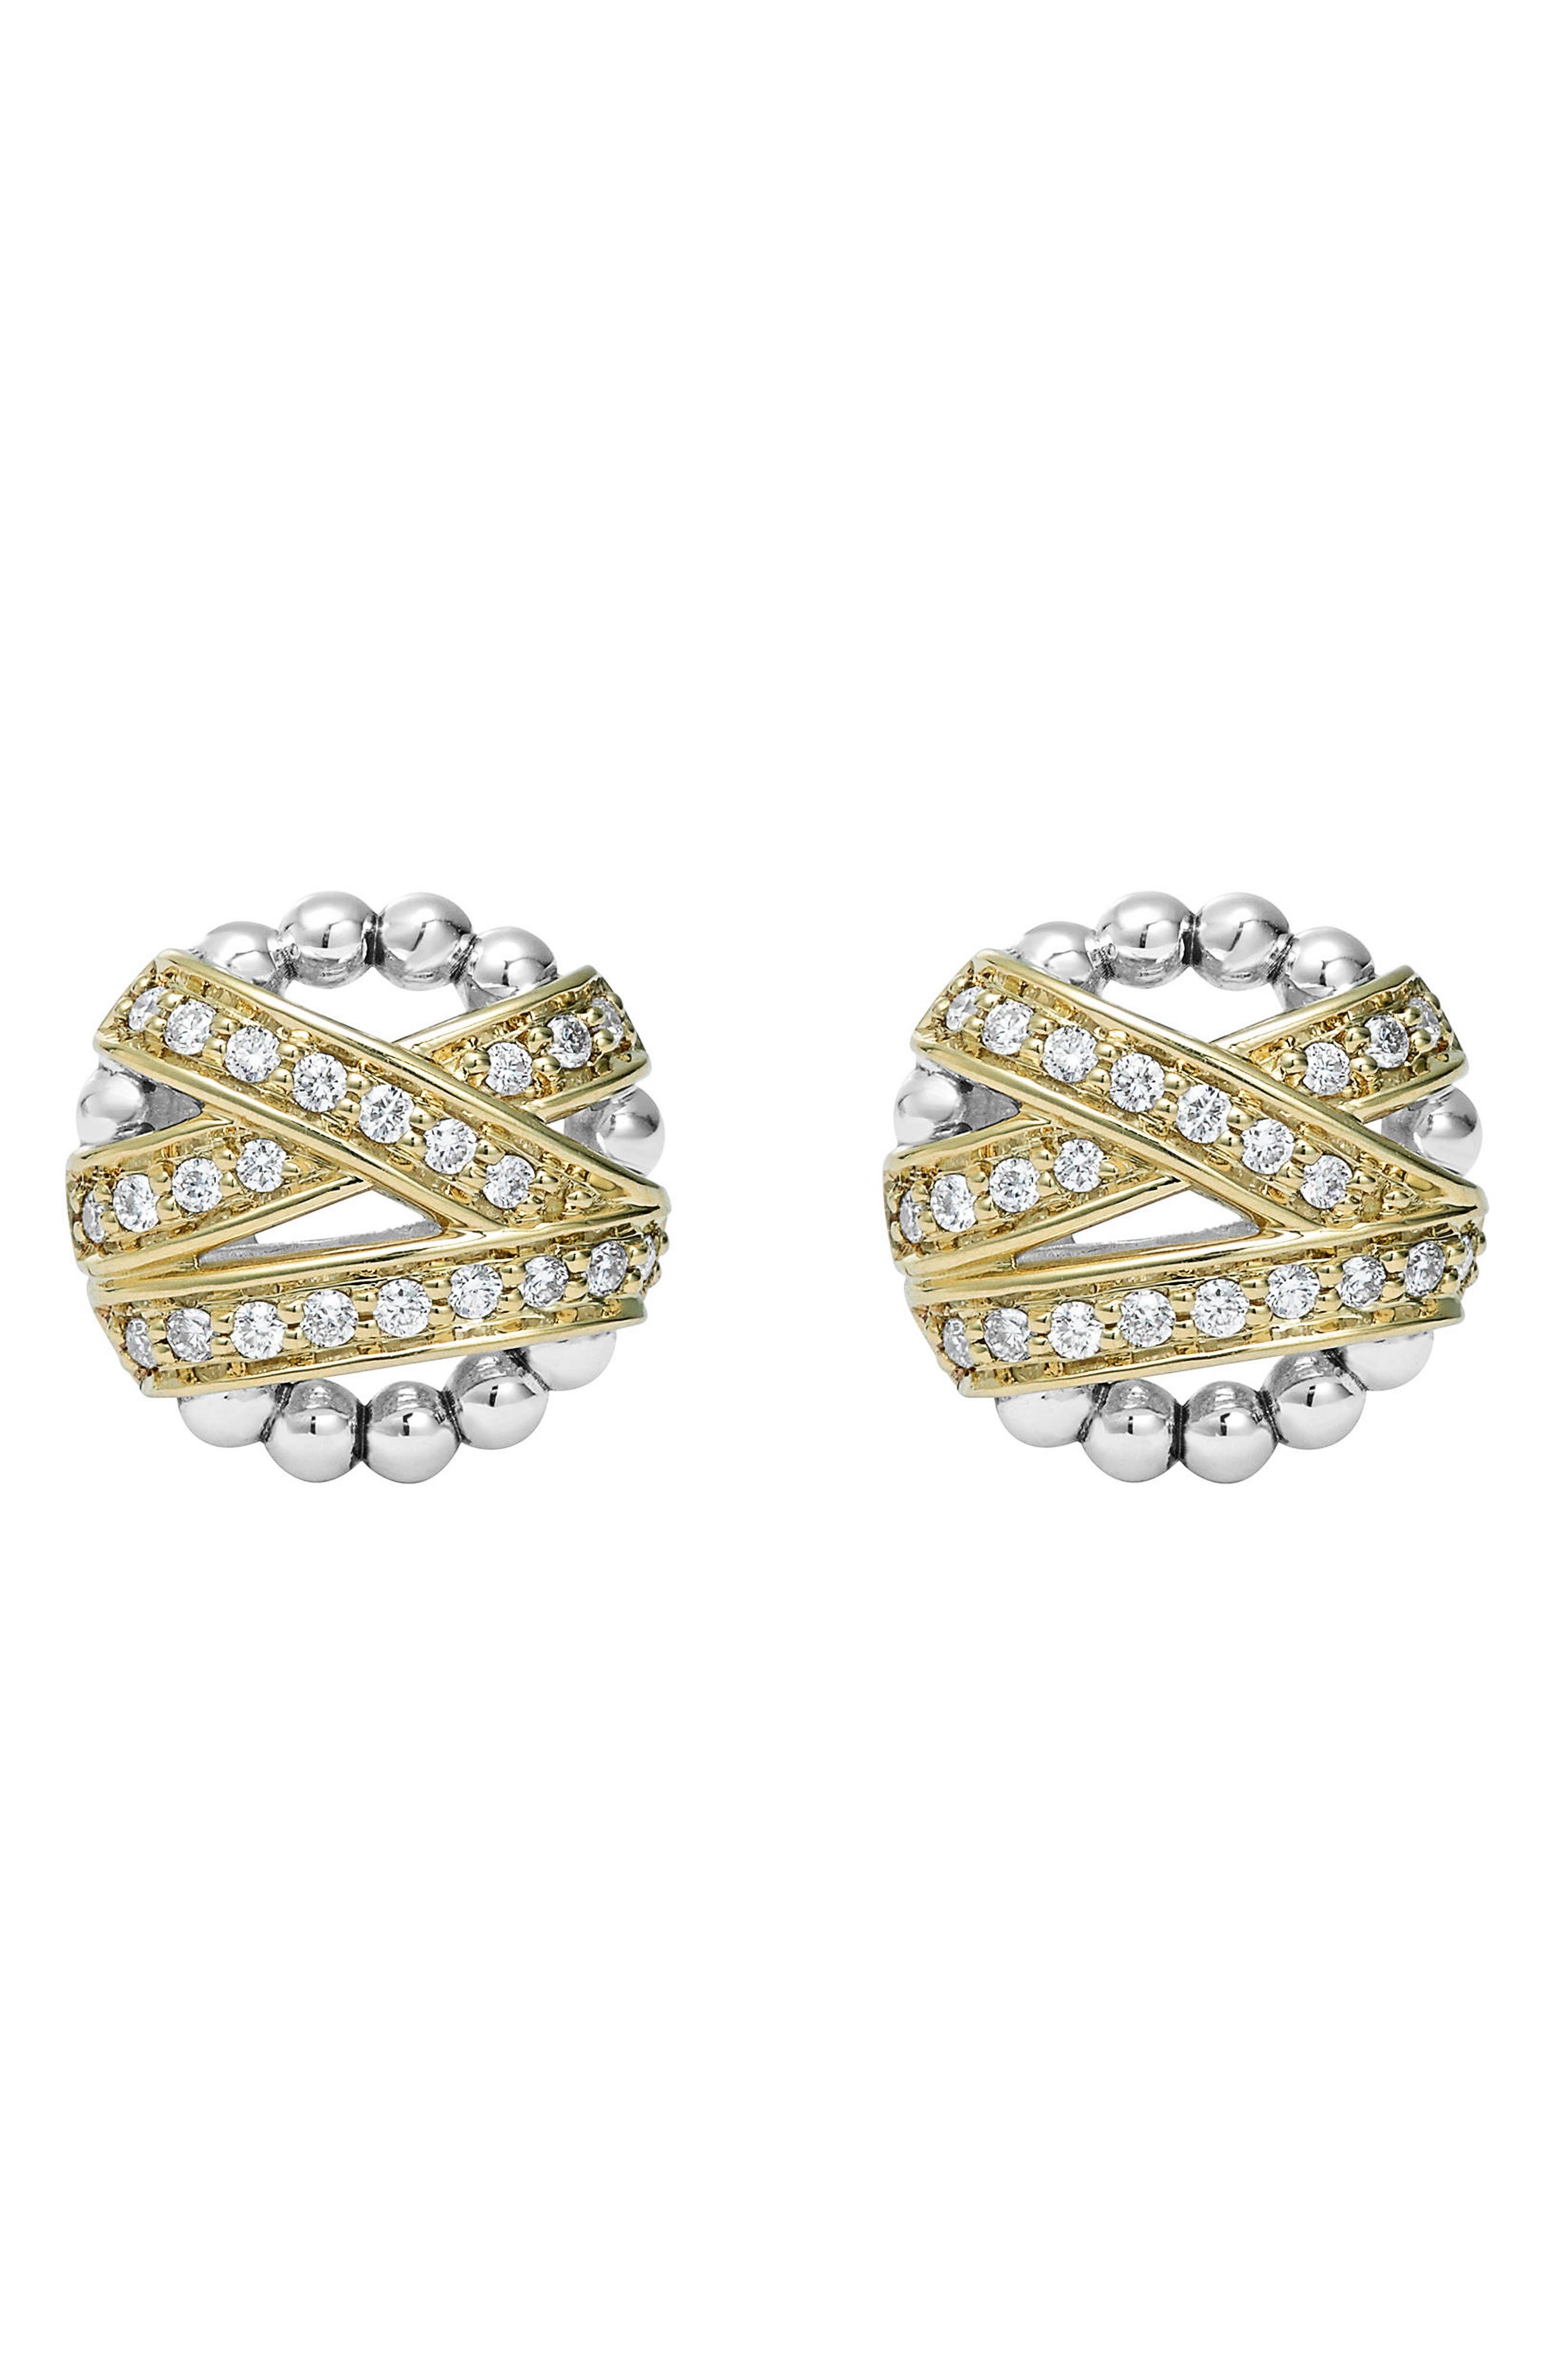 'Diamonds & Caviar' Diamond Stud Earrings,                             Alternate thumbnail 2, color,                             Silver/ Gold